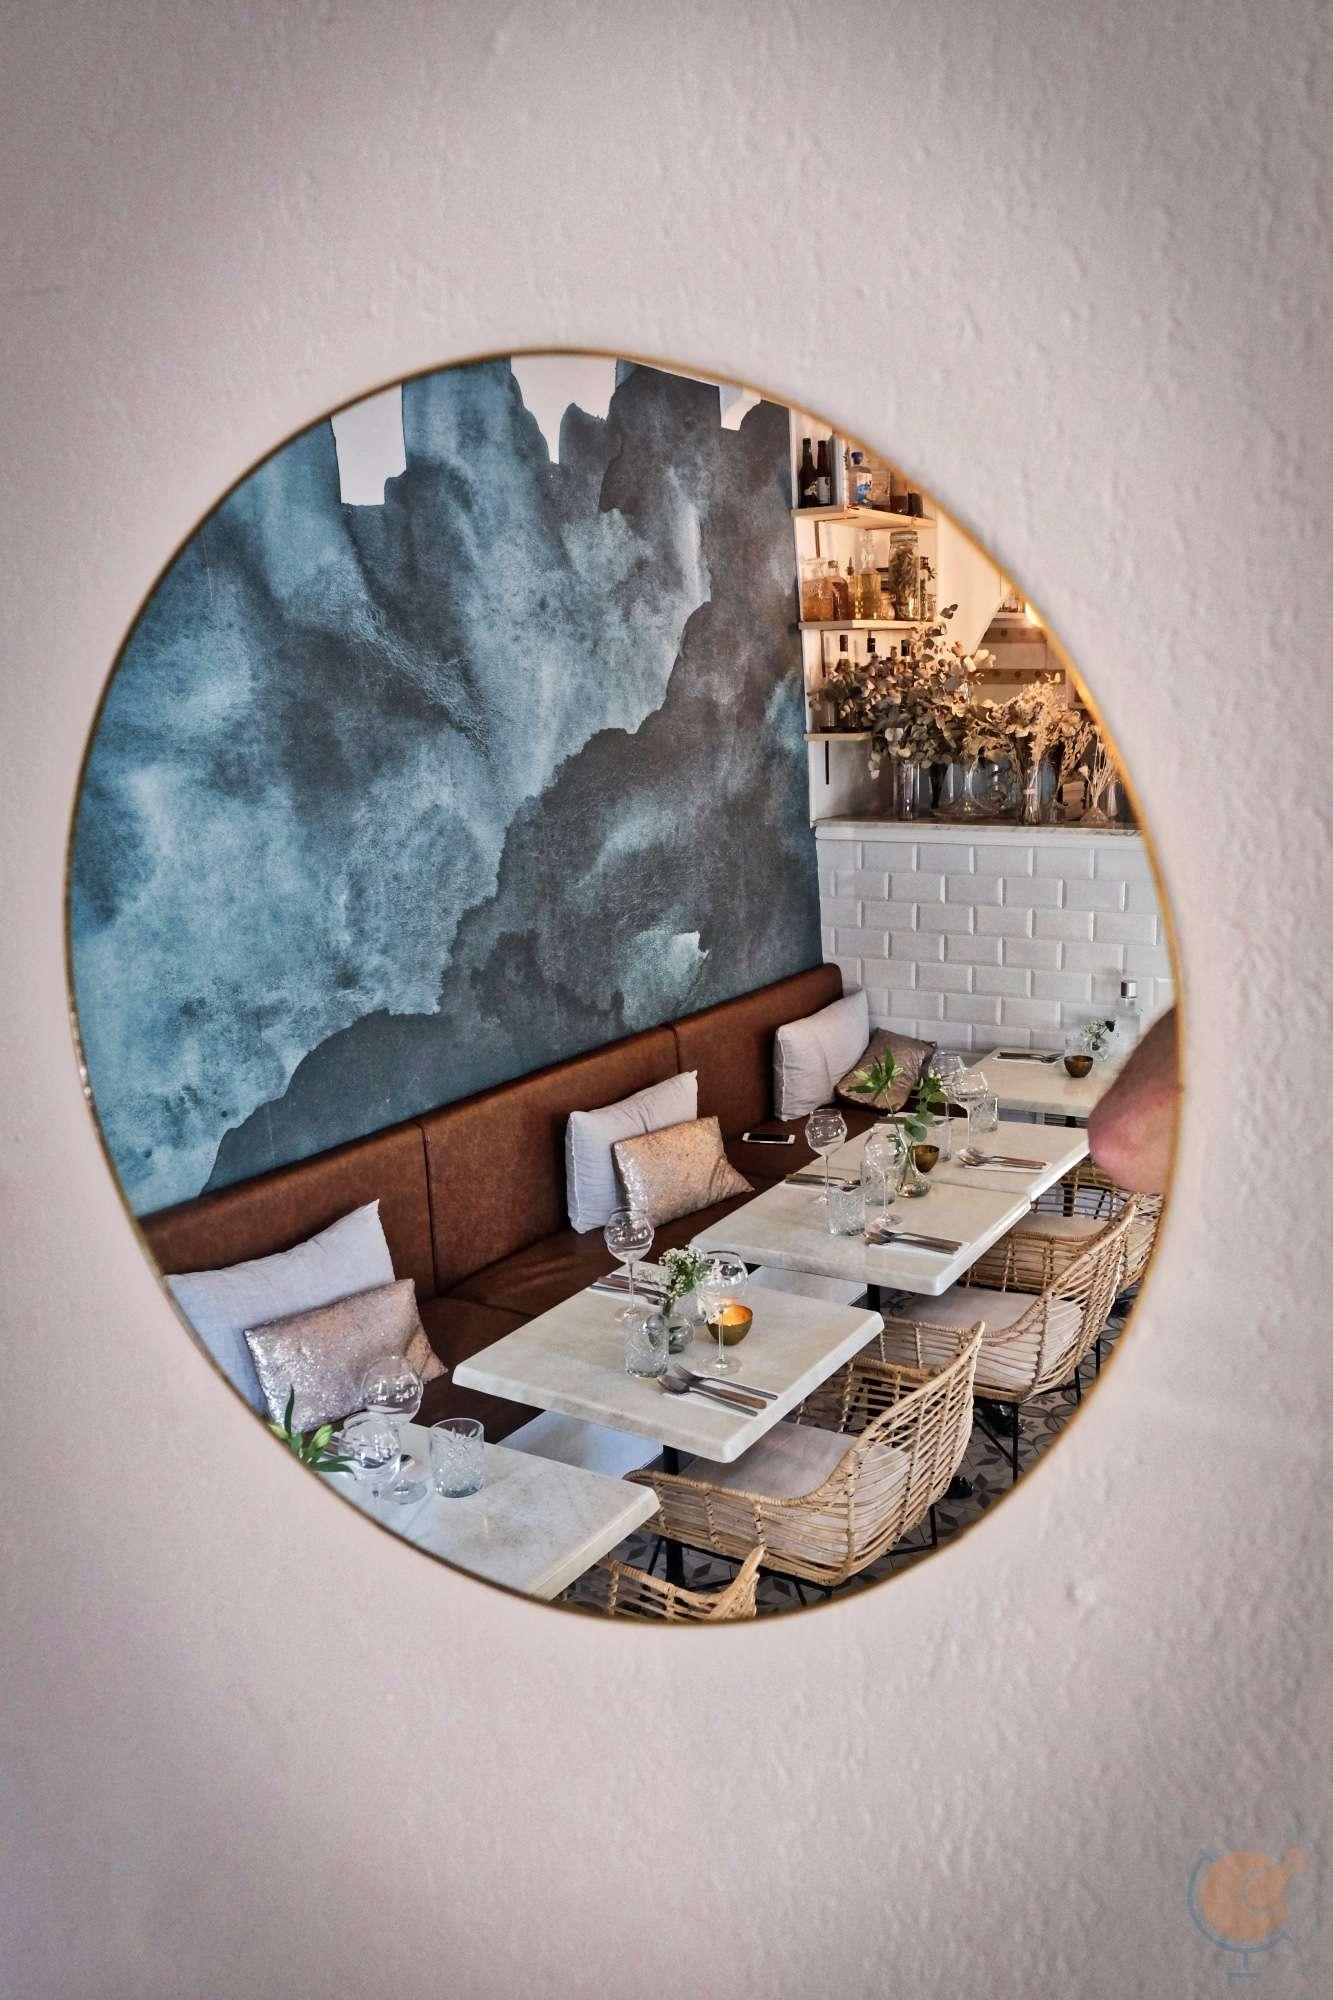 dscf1344_les_agitateurs_restaurant_france_nice_nizza_vilagevo_jokuti_andras_l_w.jpg